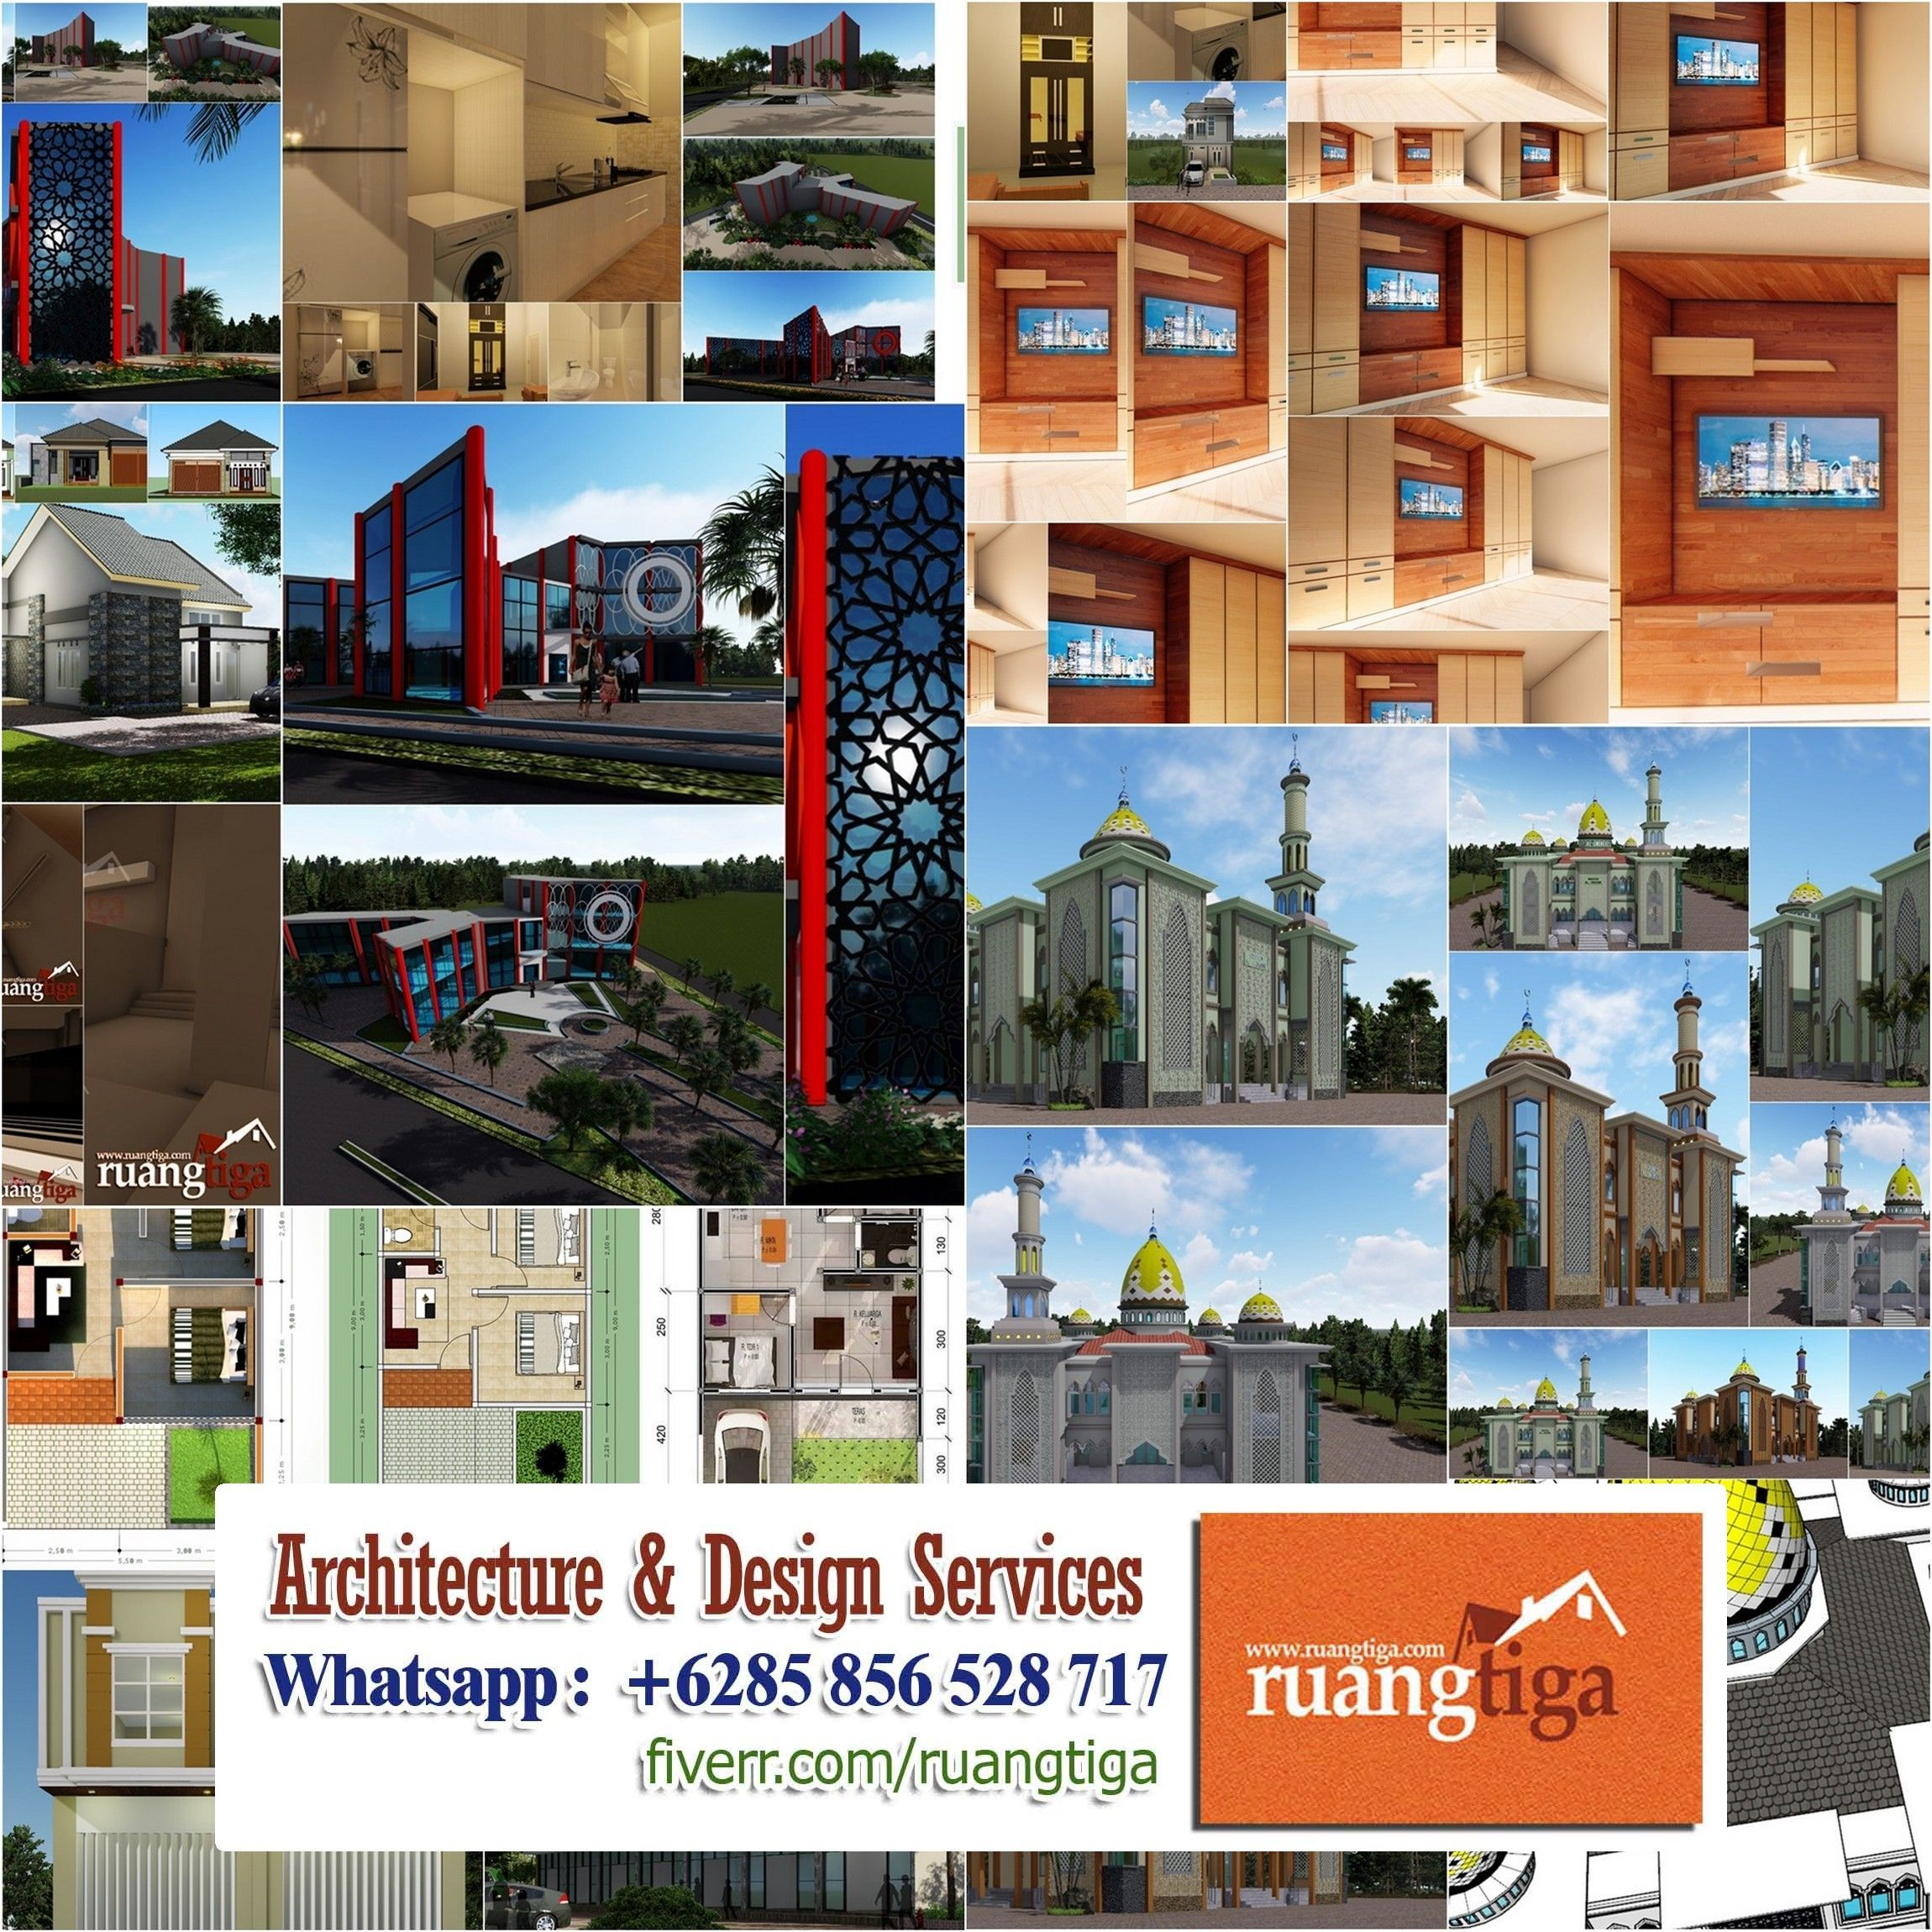 Whatsapp 6285856528717 Architectural Design House Plans Design Services Architecture Post De Architecture Design Architecture Design